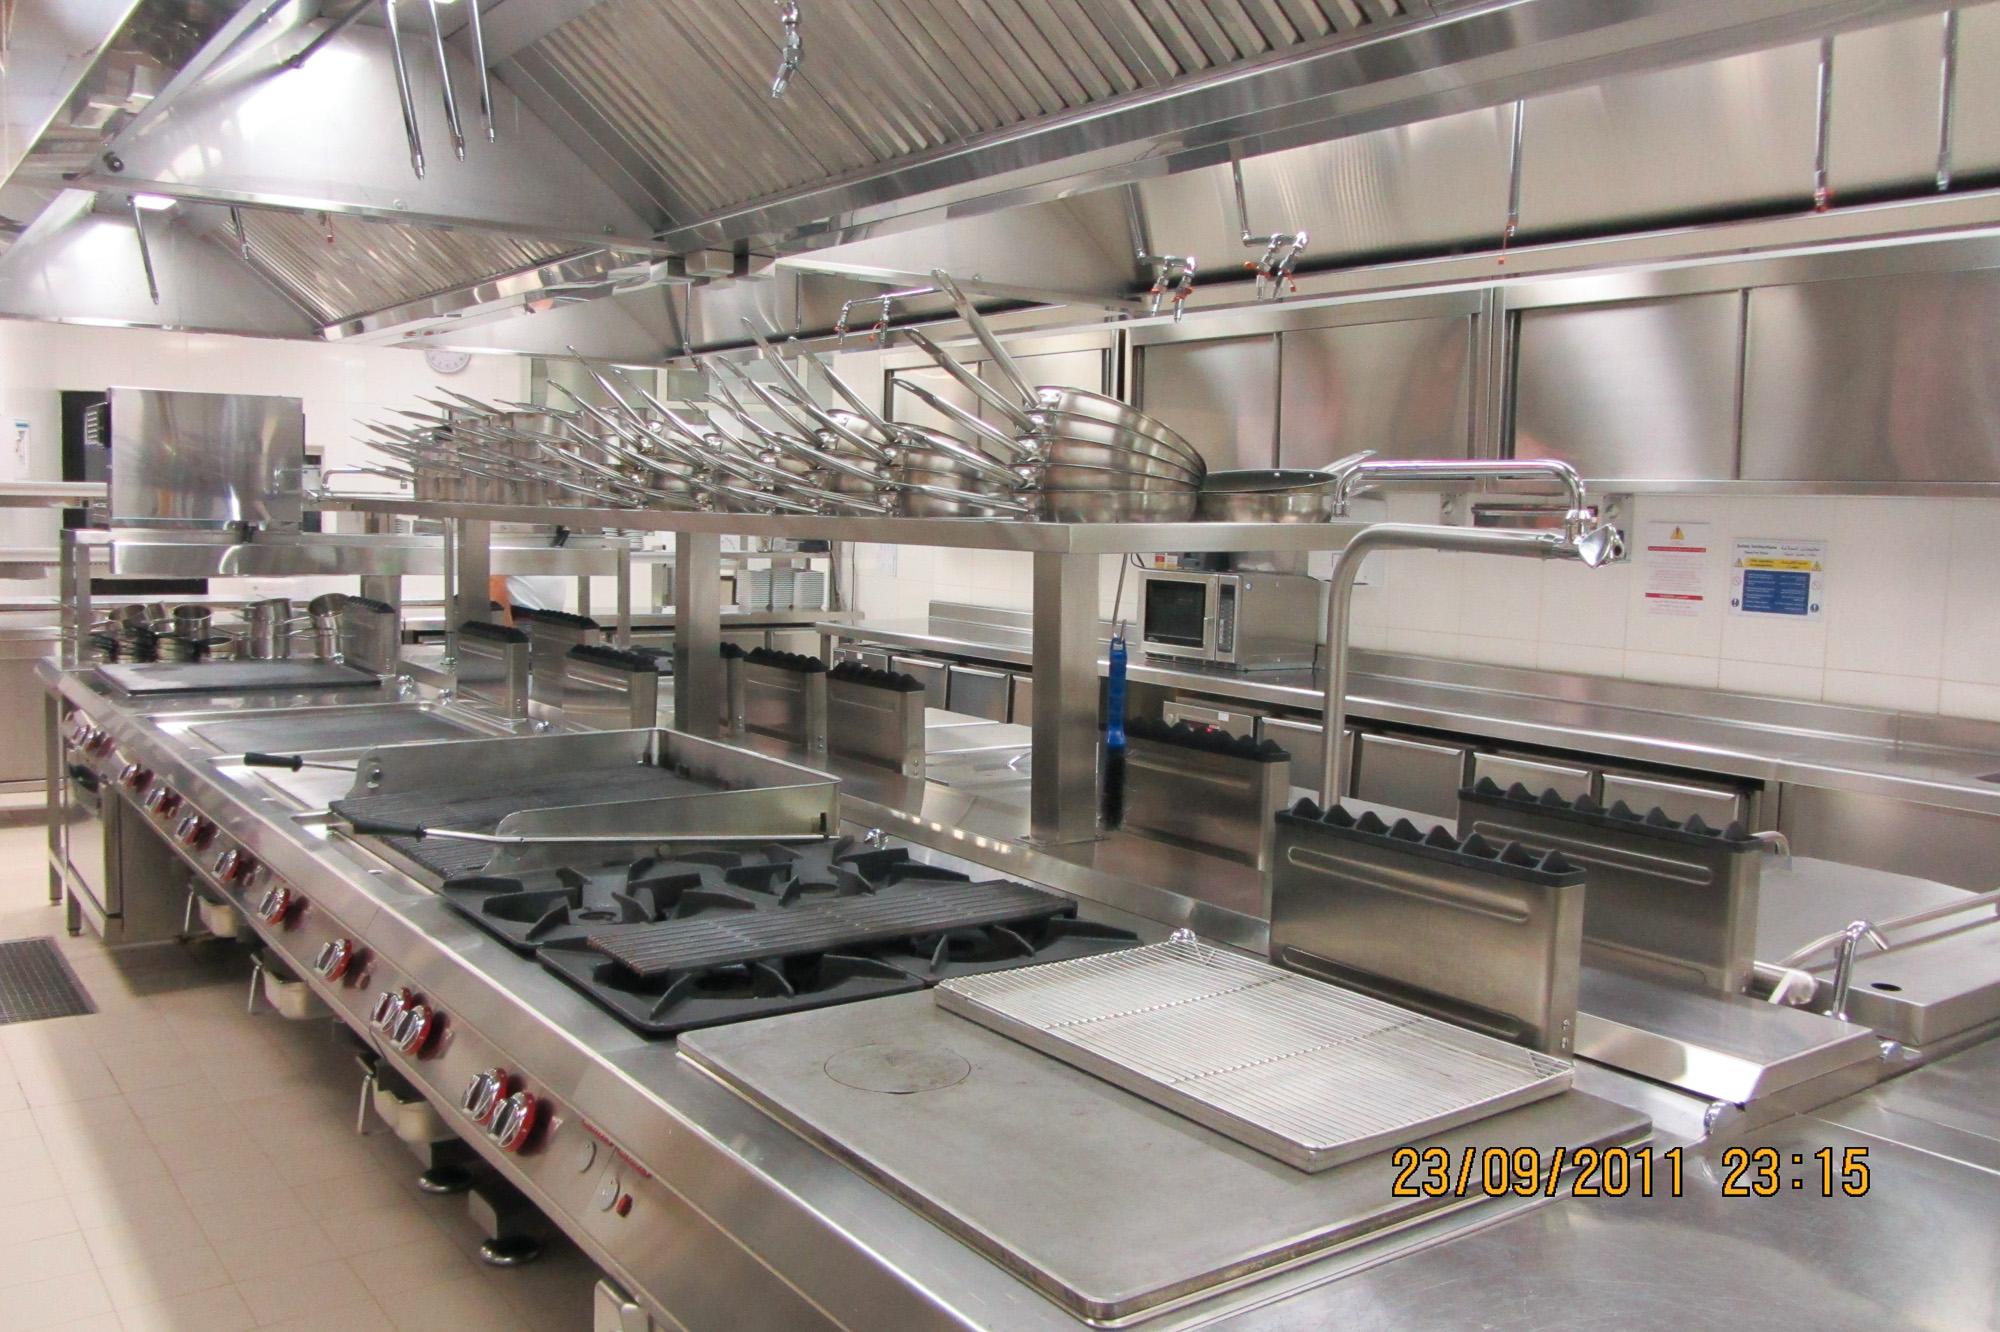 Italia_kitchen_-le_meridien_r-7